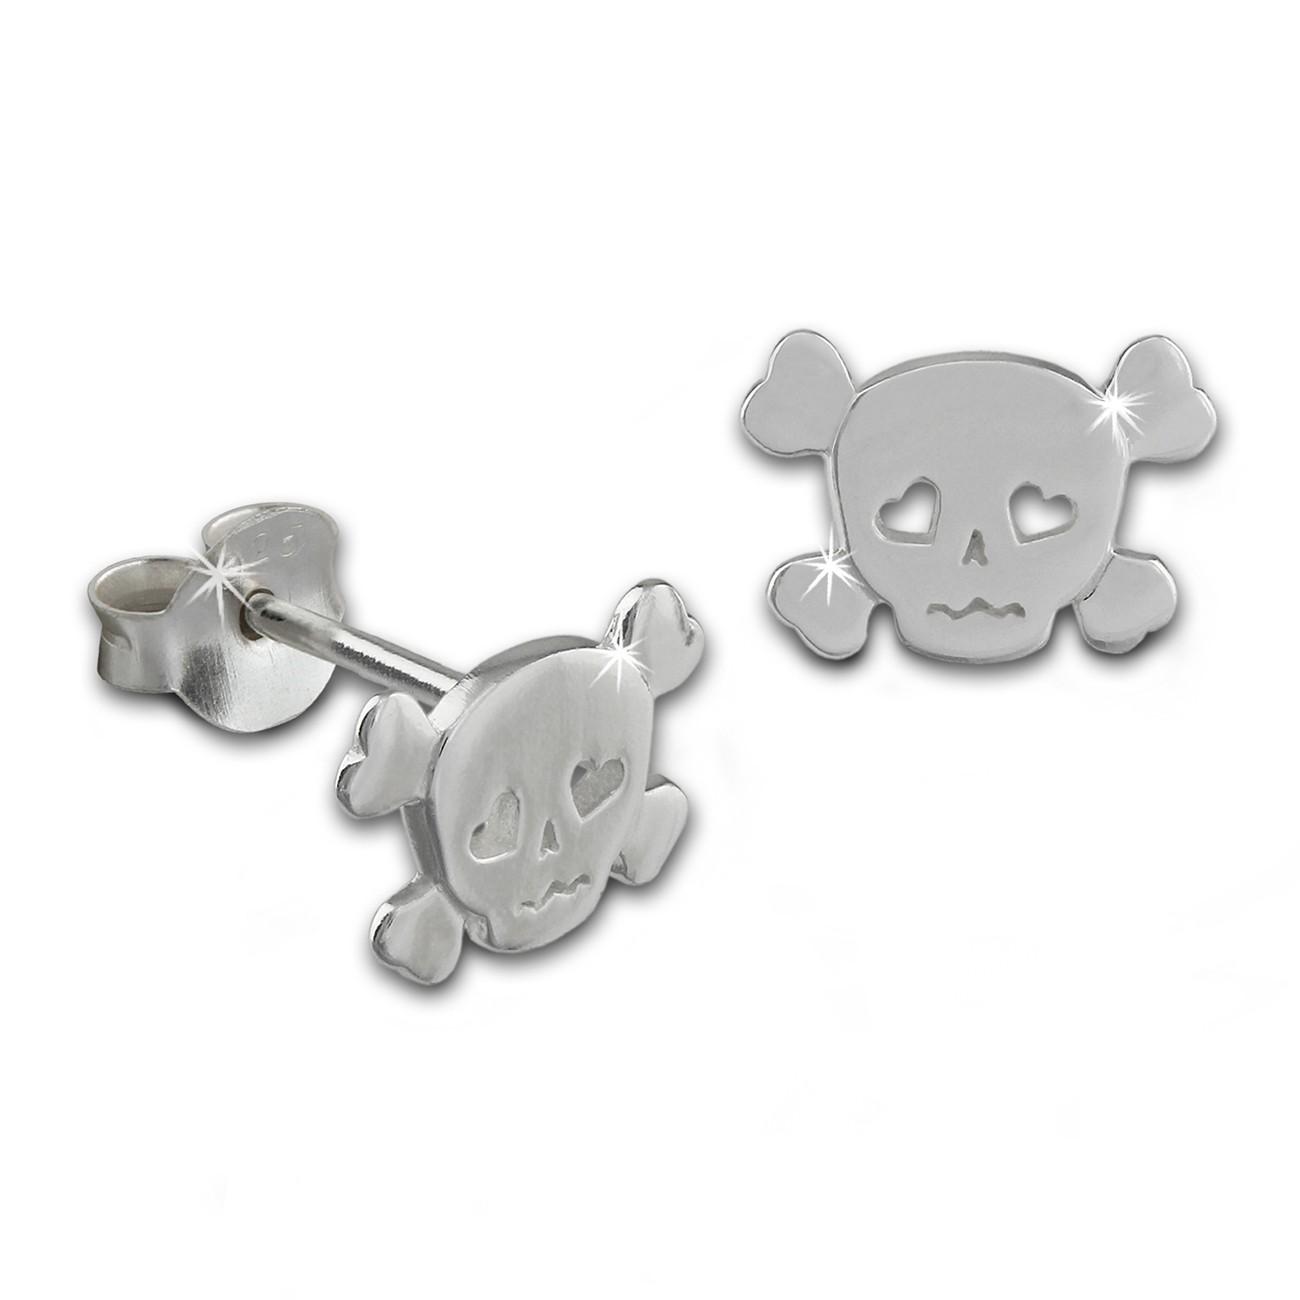 SilberDream Ohrstecker Totenkopf 925 Sterling Silber Ohrring SDO8208J